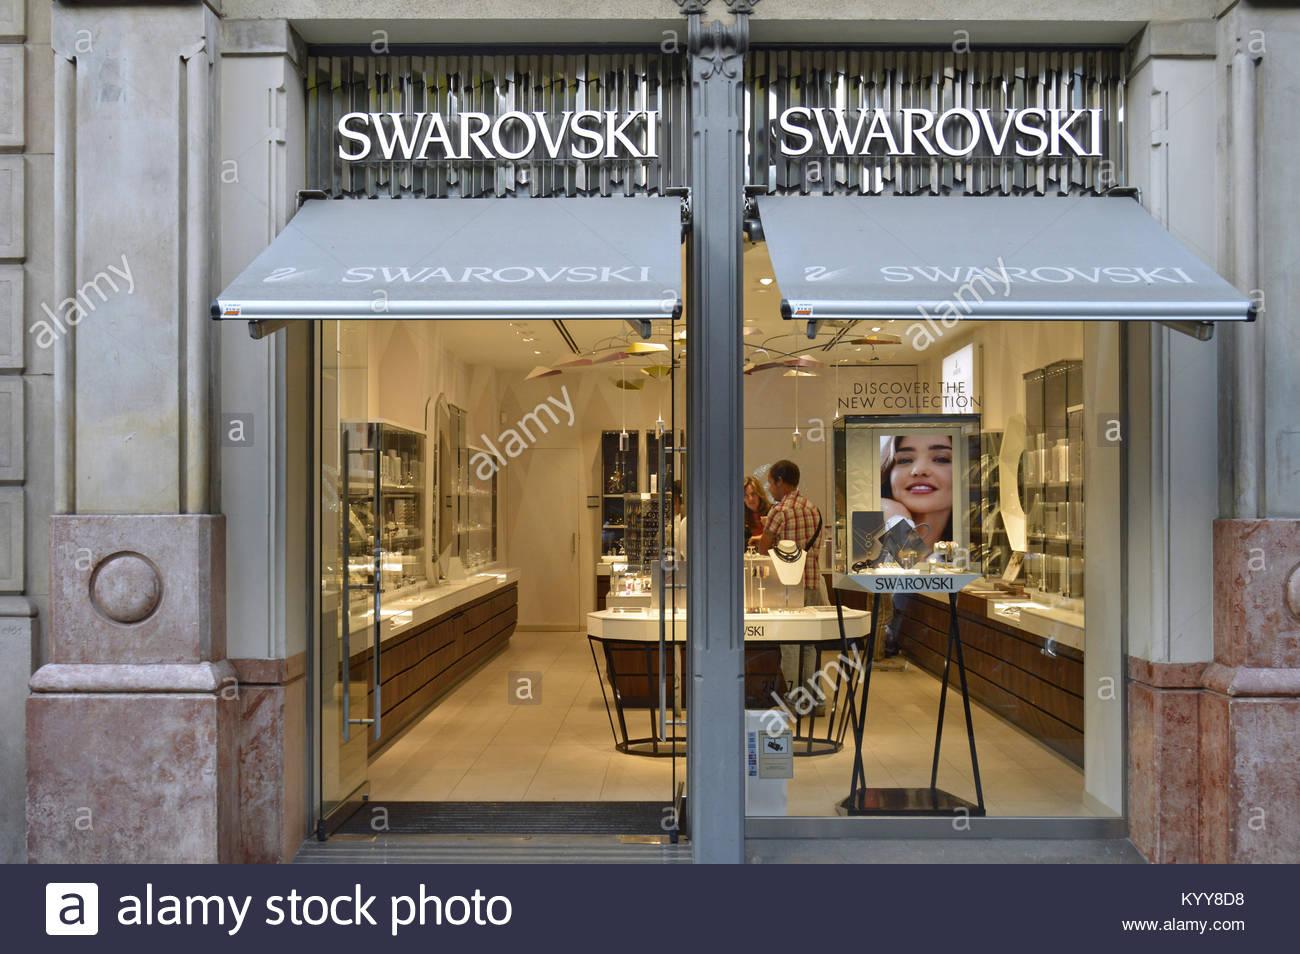 01835c3df3d0 Swarovski crystal jewelry brand store window in Barcelona Spain Europe -  Stock Image